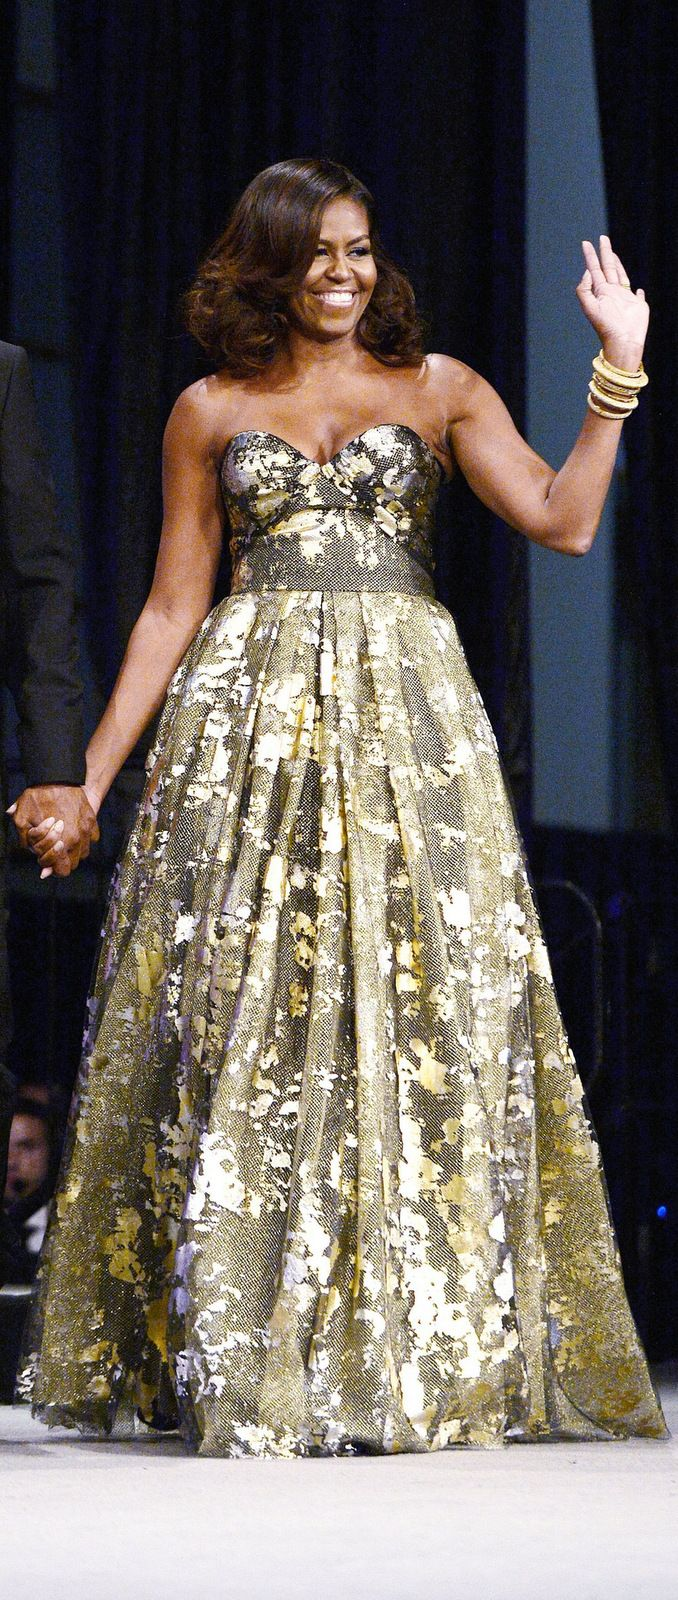 Michelle Obama in Naeem Khan at the Phoenix Awards Dinner